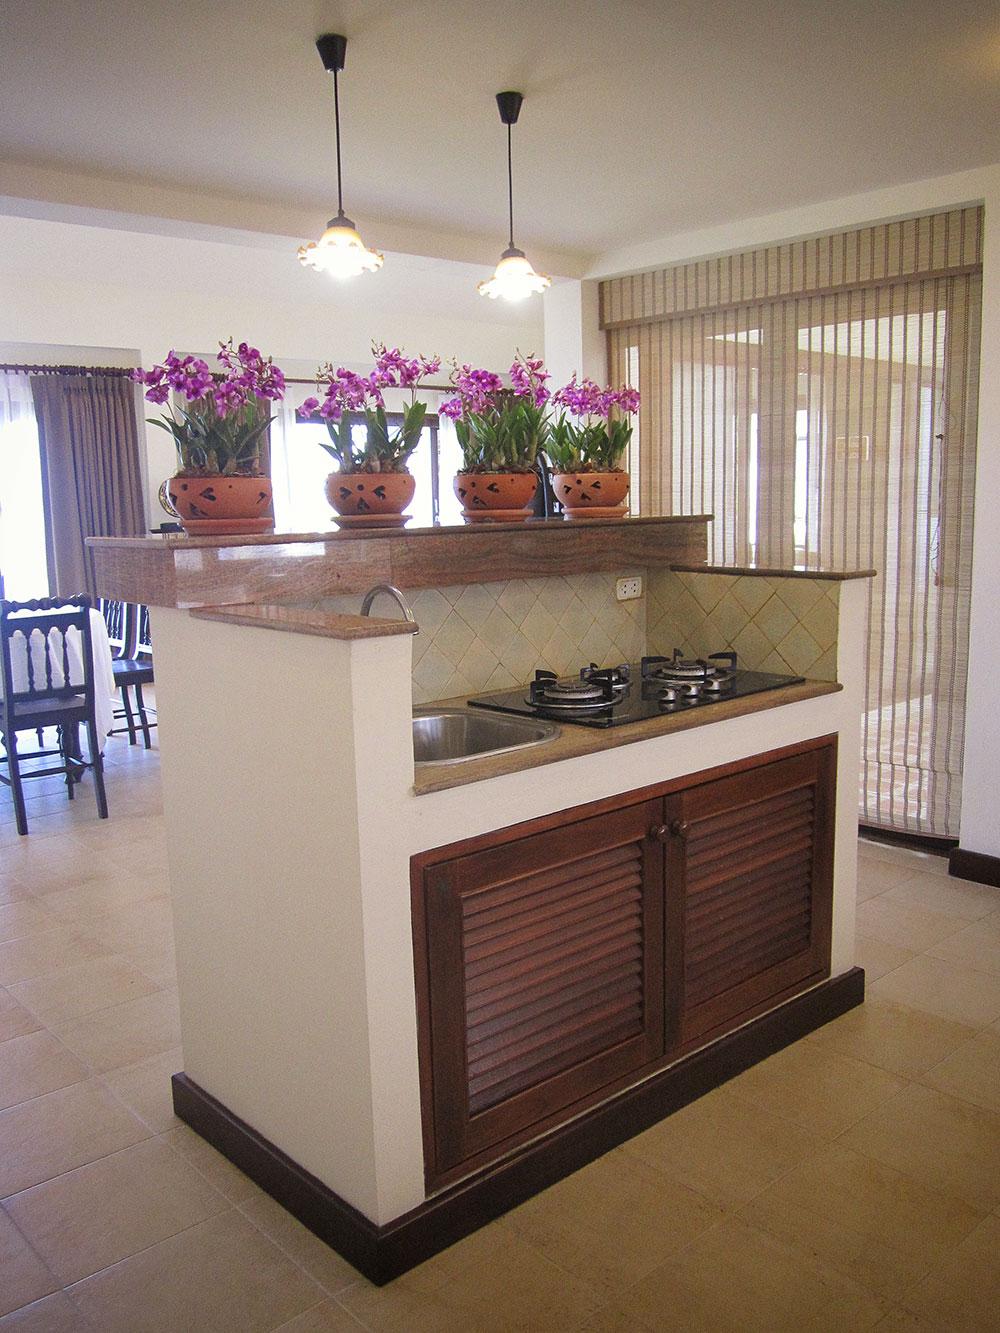 RE/MAX Island Real Estate Agency's 4 bedroom villa for rent in Bang Por, Ko Samui  16